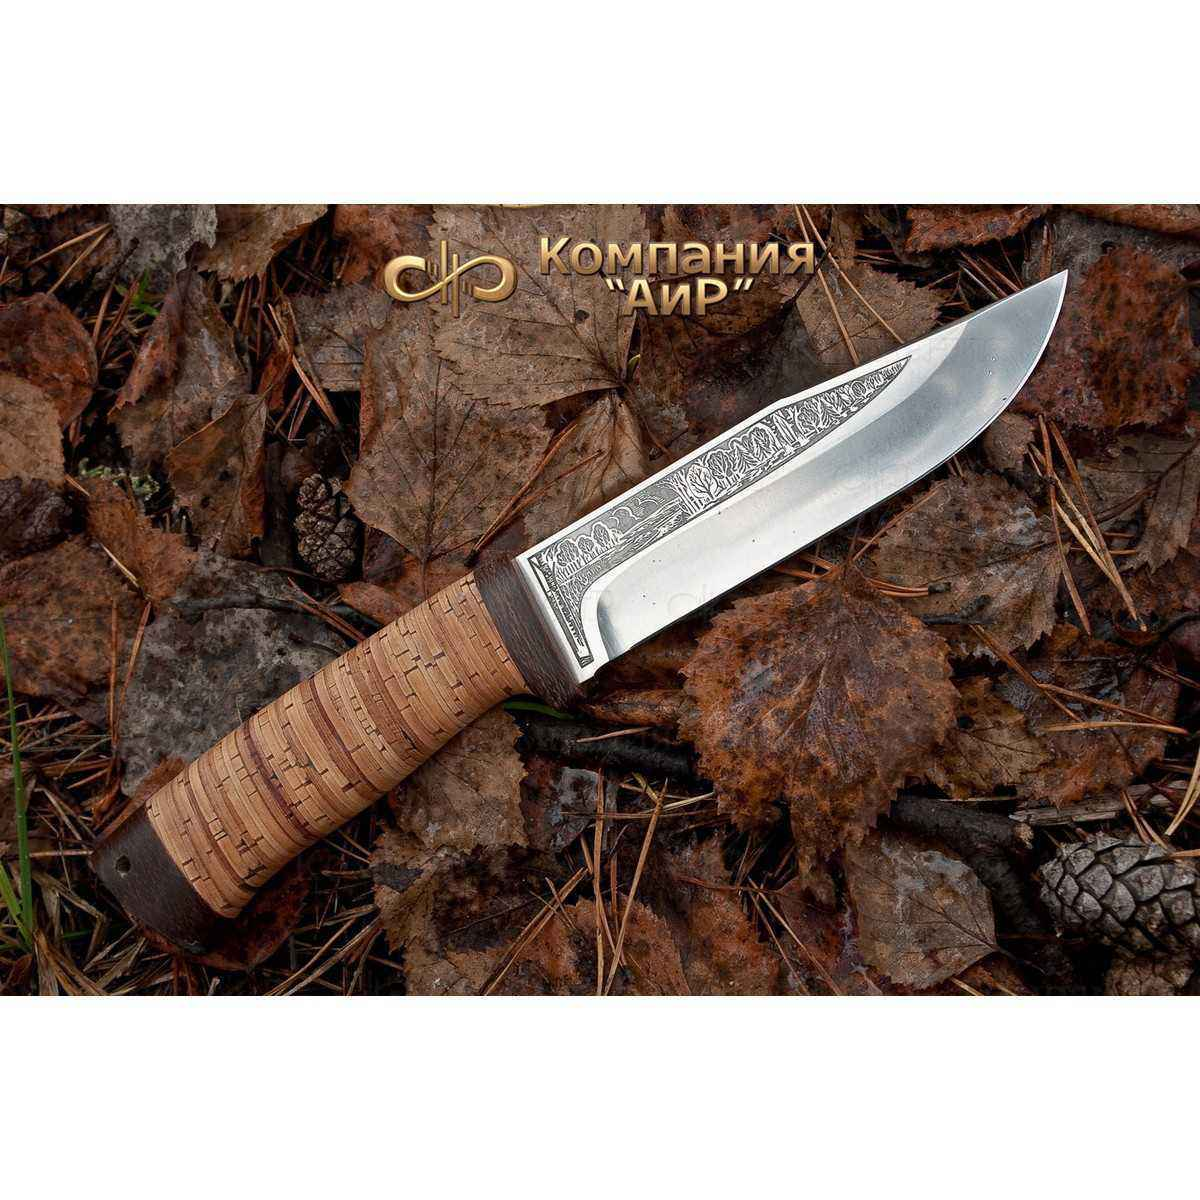 Нож АиР Турист, сталь 110х18 М-ШД, рукоять береста